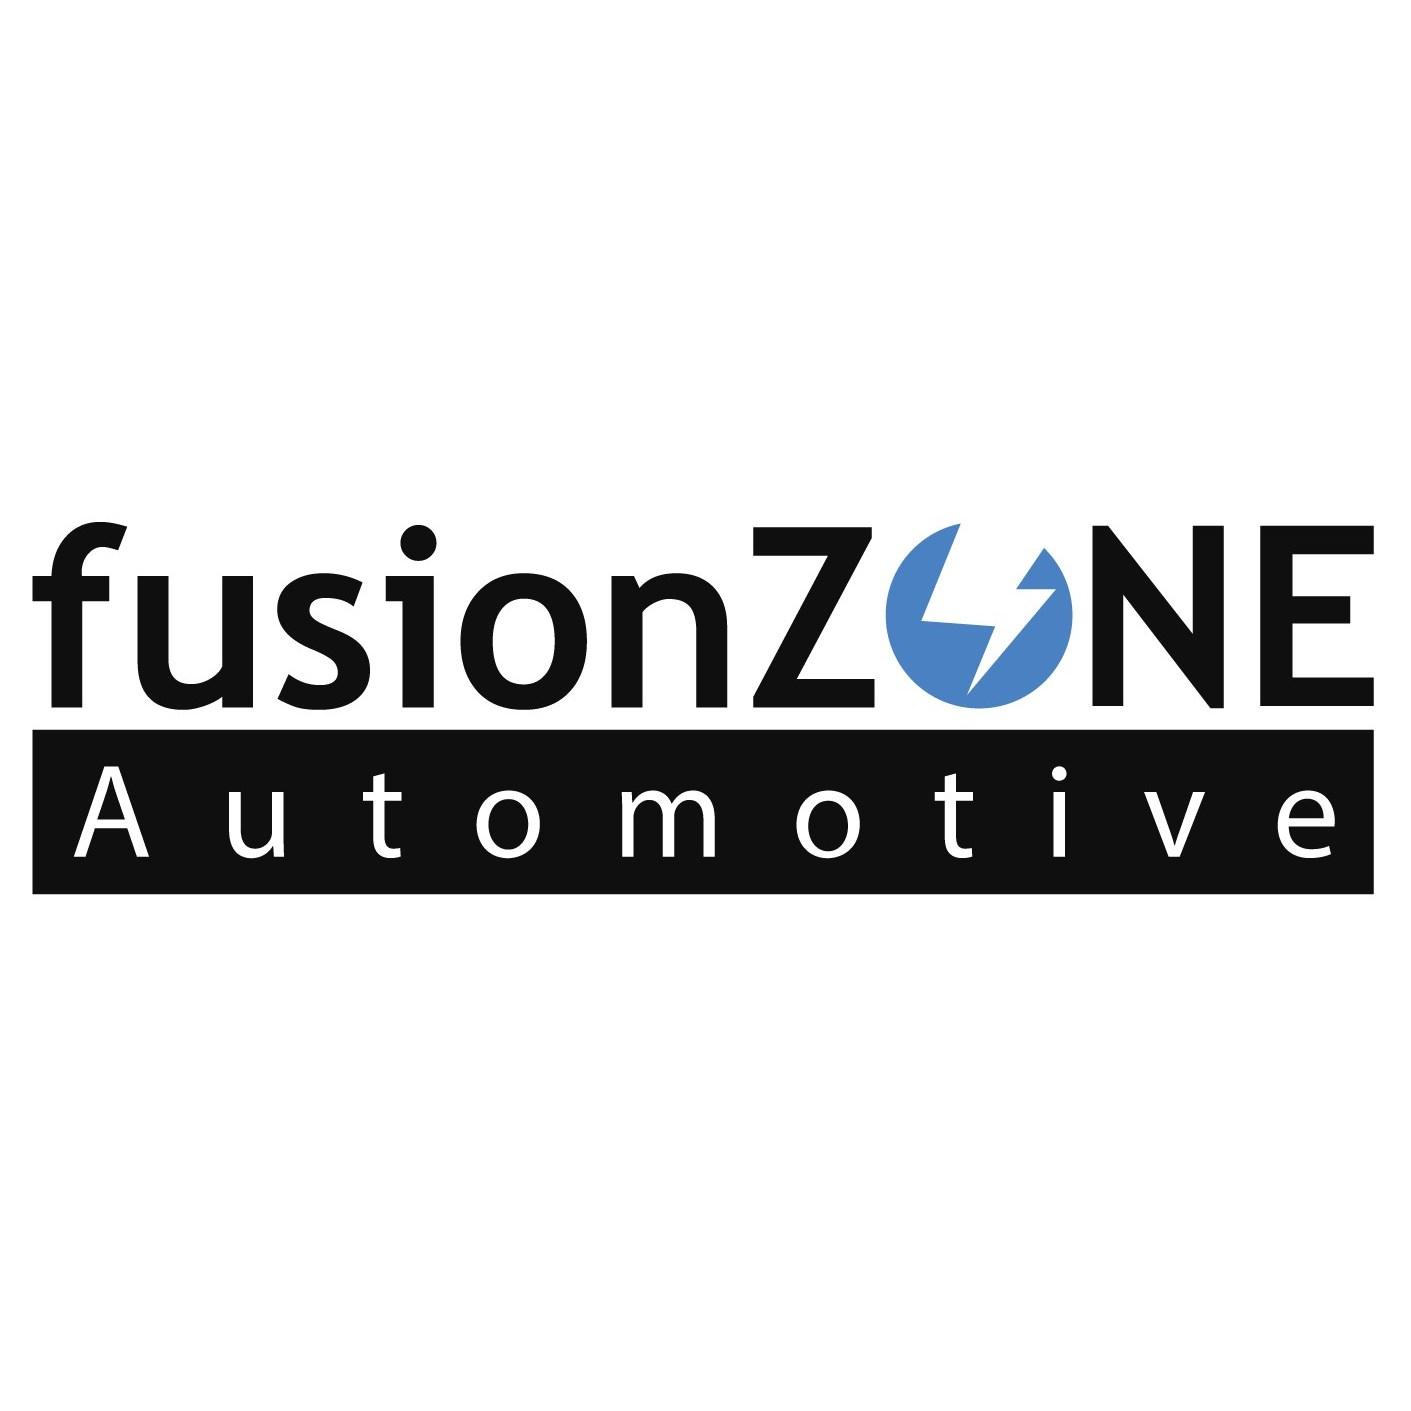 fusionzone logo (1)